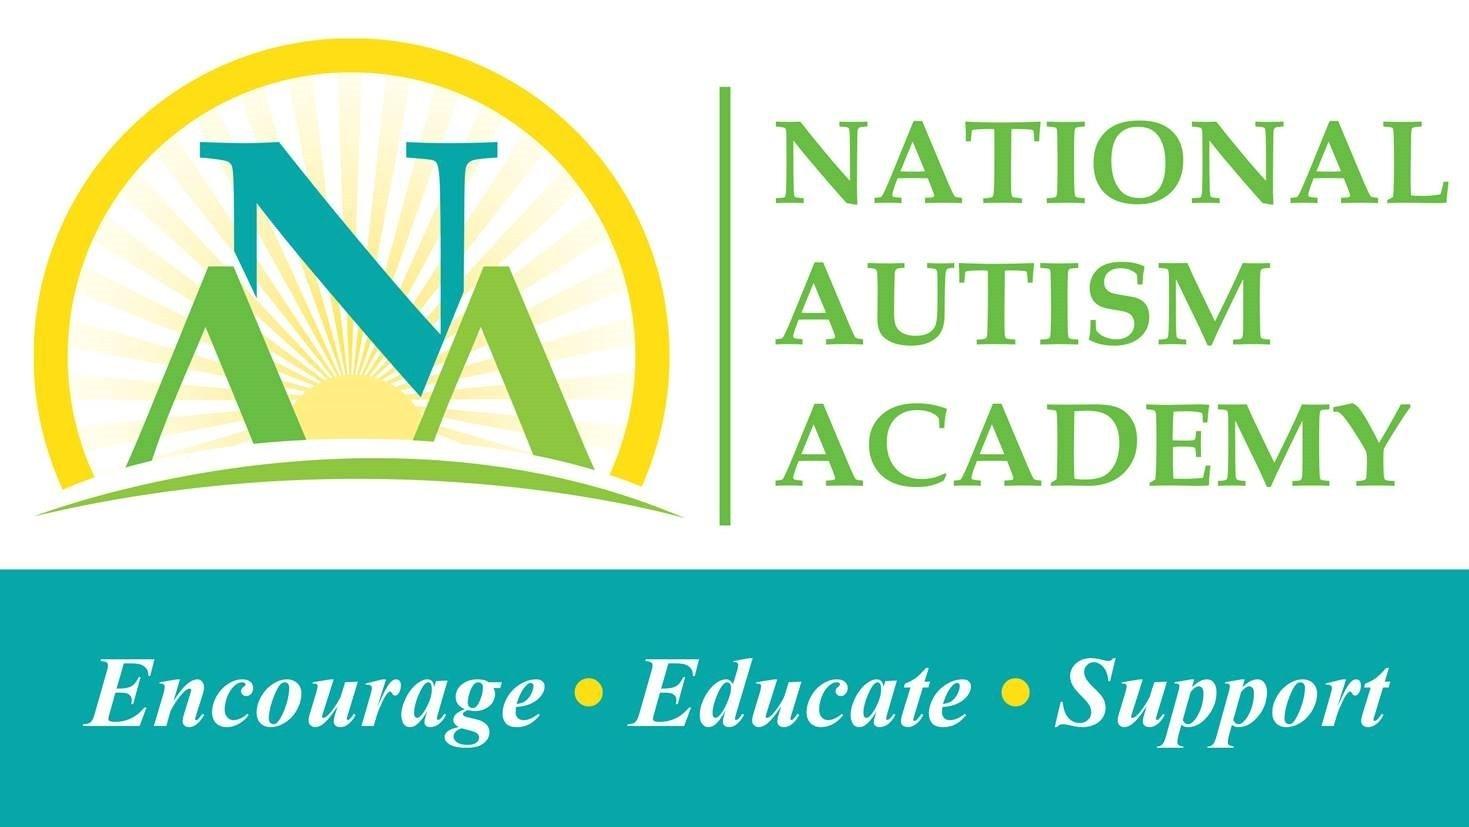 National Autism Academy